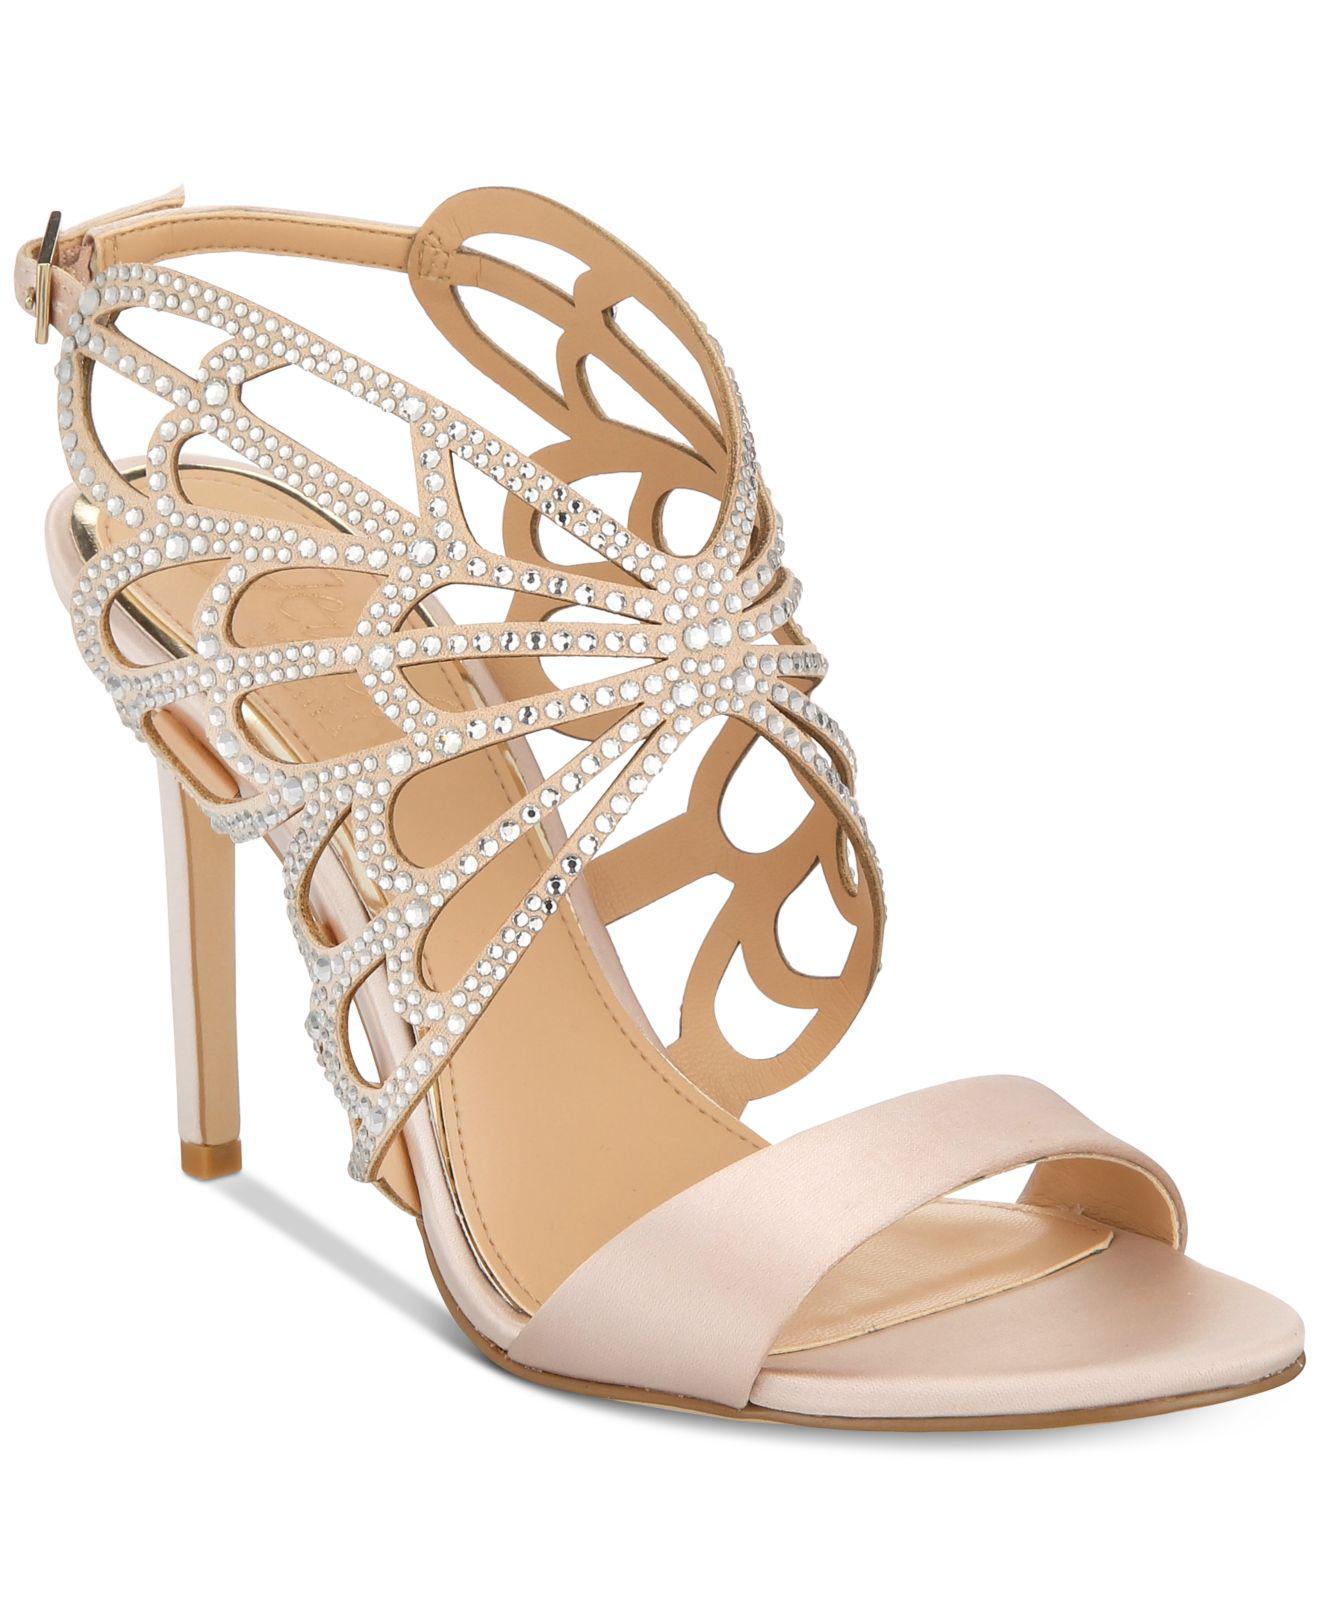 5c52f888920 Badgley Mischka Taresa Evening Sandals - Lyst